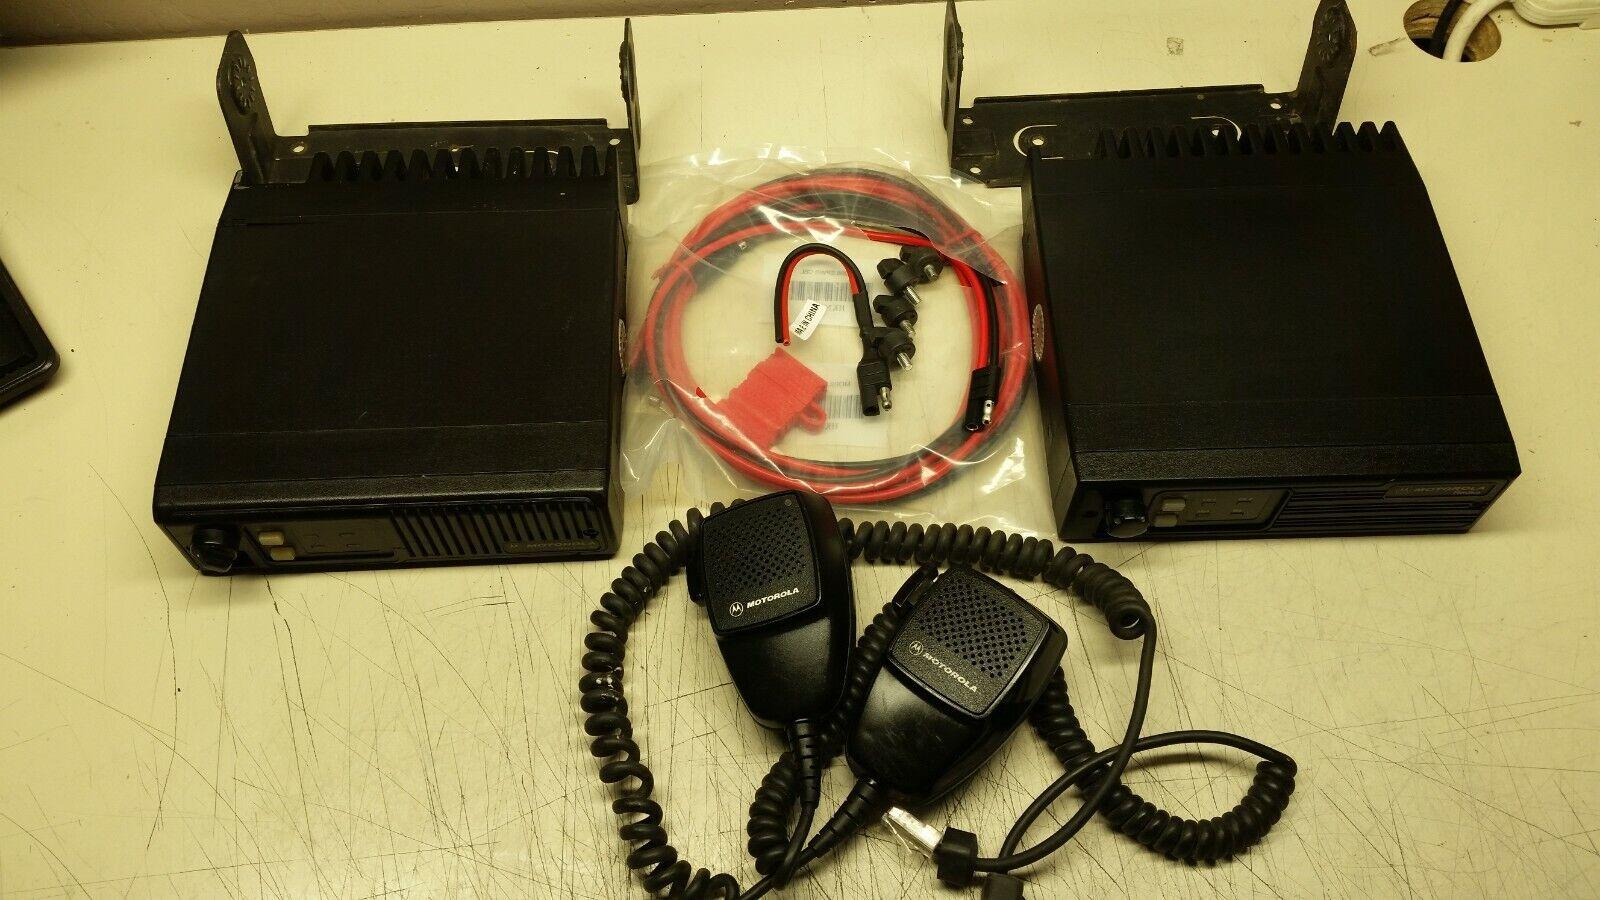 GMRS LOT OF 2 MOTOROLA RADIO UHF 440 -470 MHz 30 WATT HAM GMRS FREE PROGRAM MICS. Available Now for 98.00